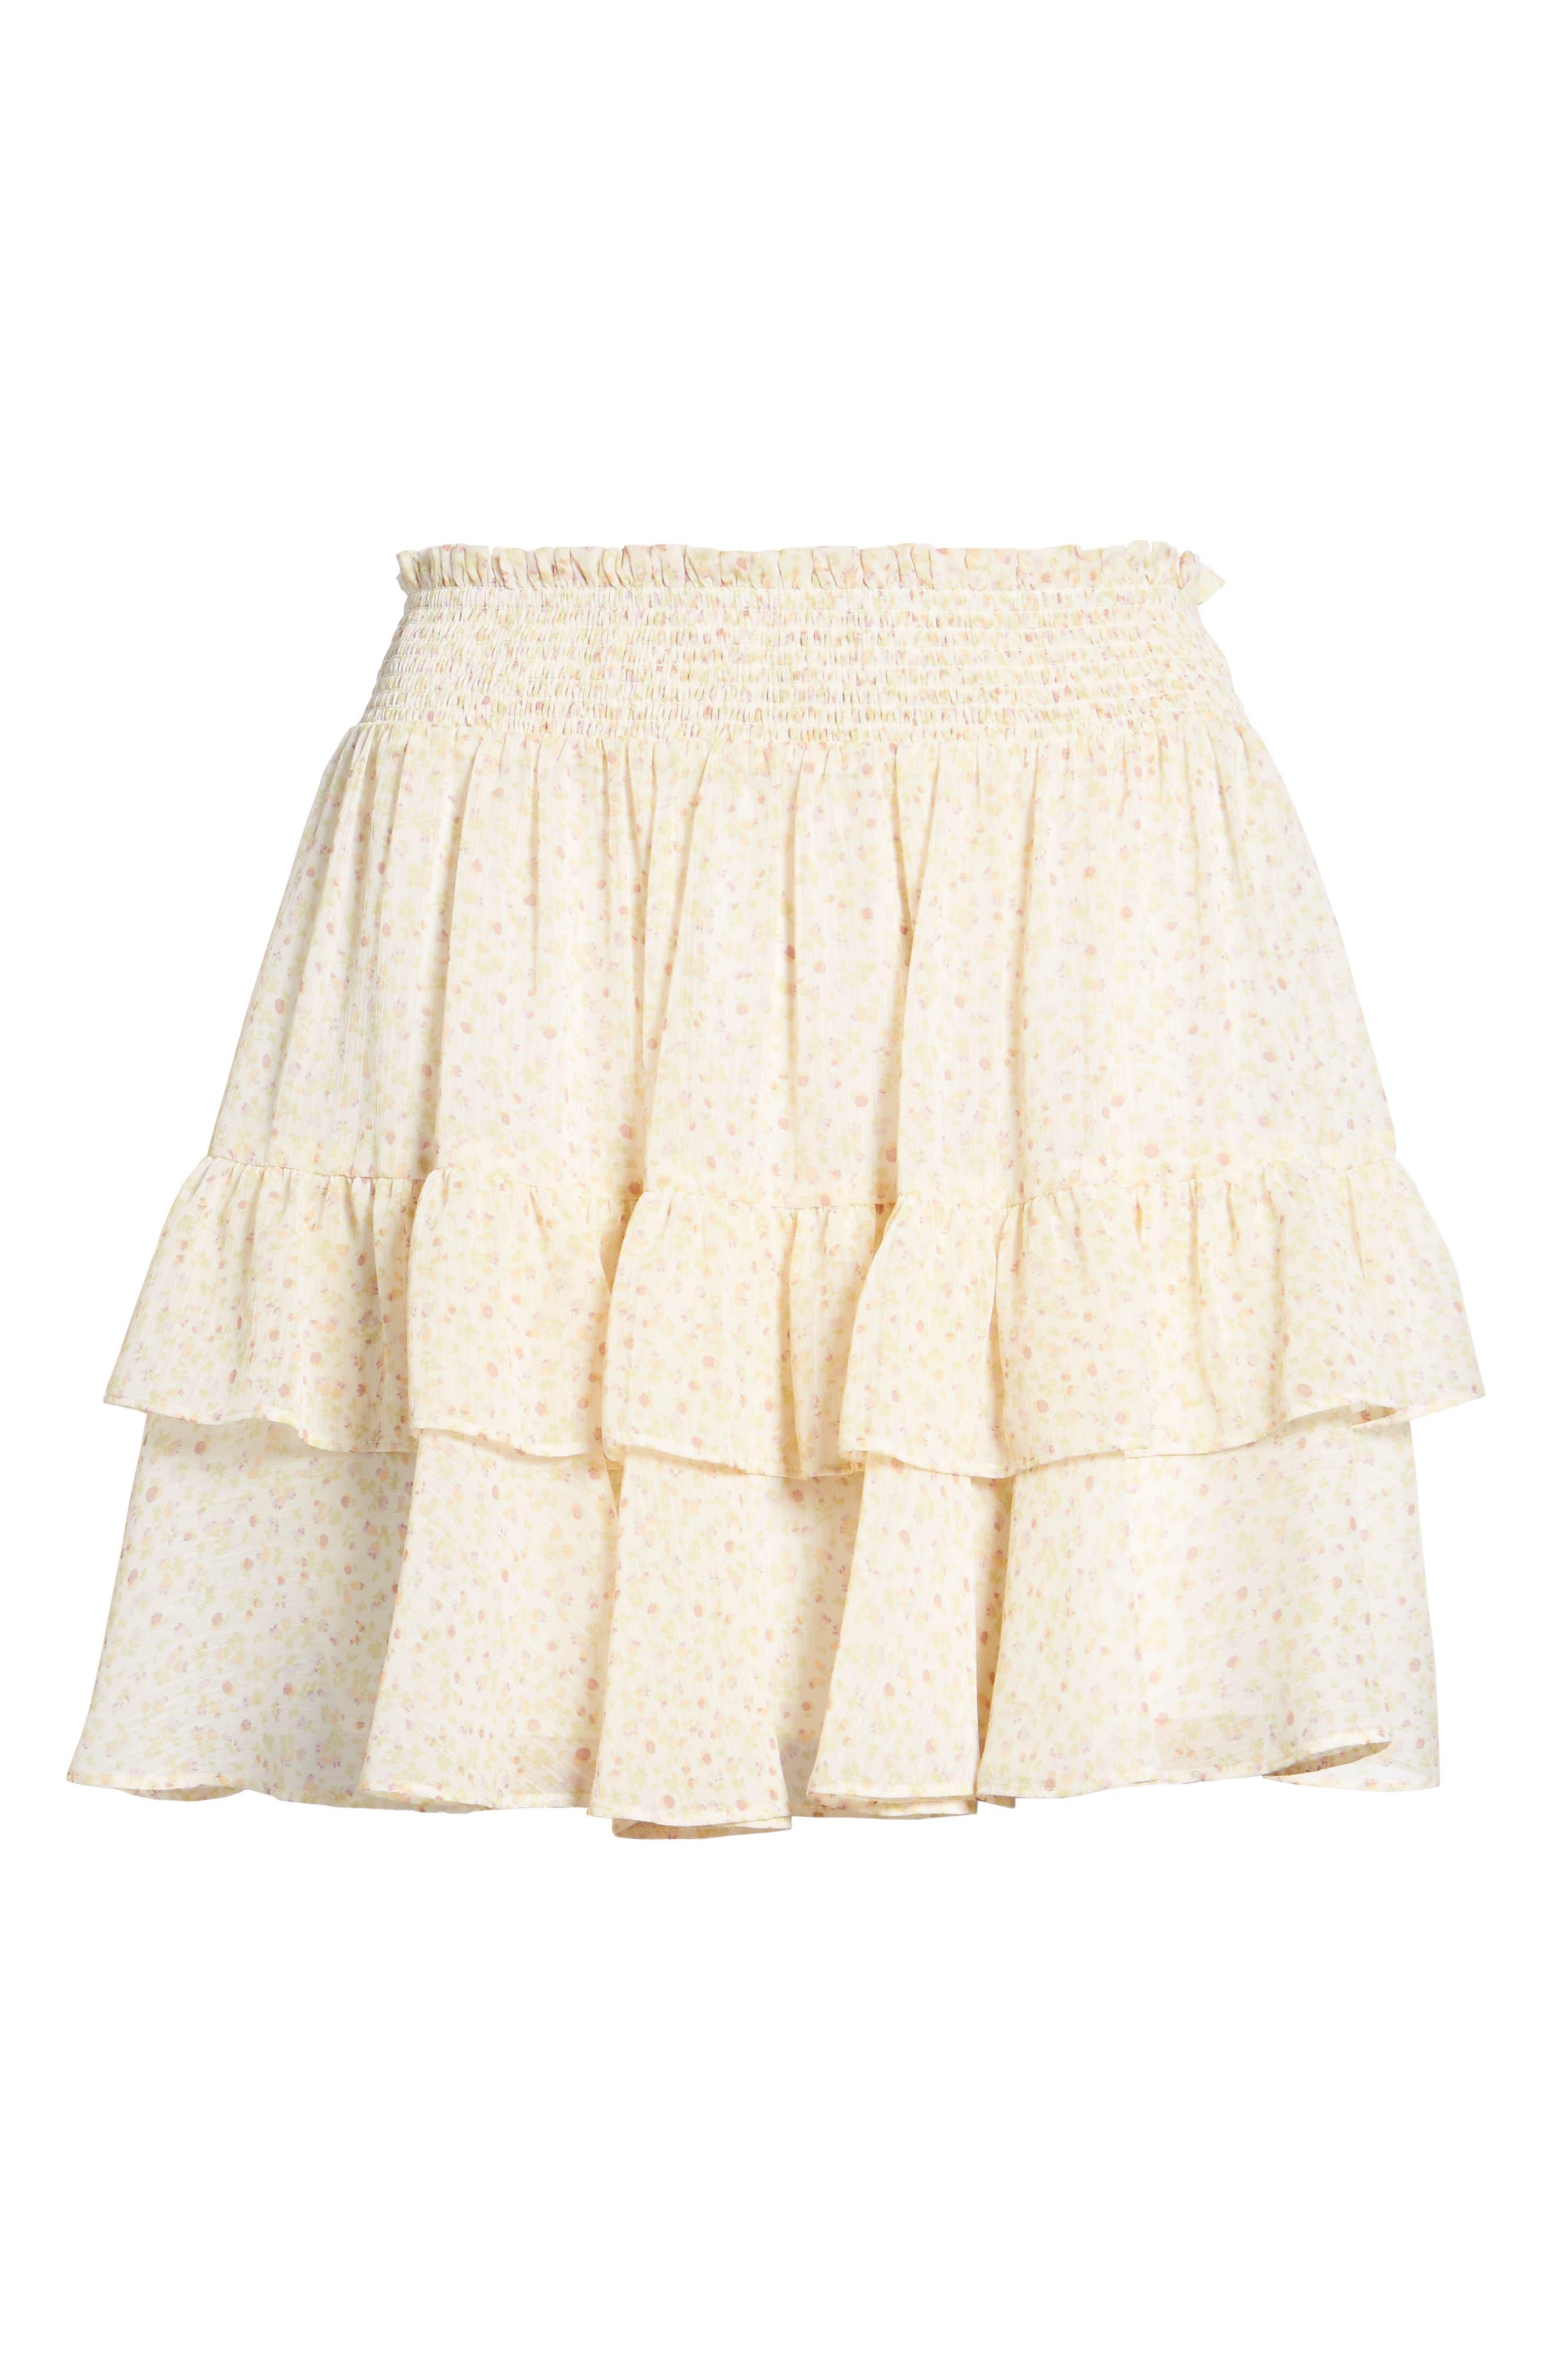 Canyon Skirt,                             Alternate thumbnail 6, color,                             900